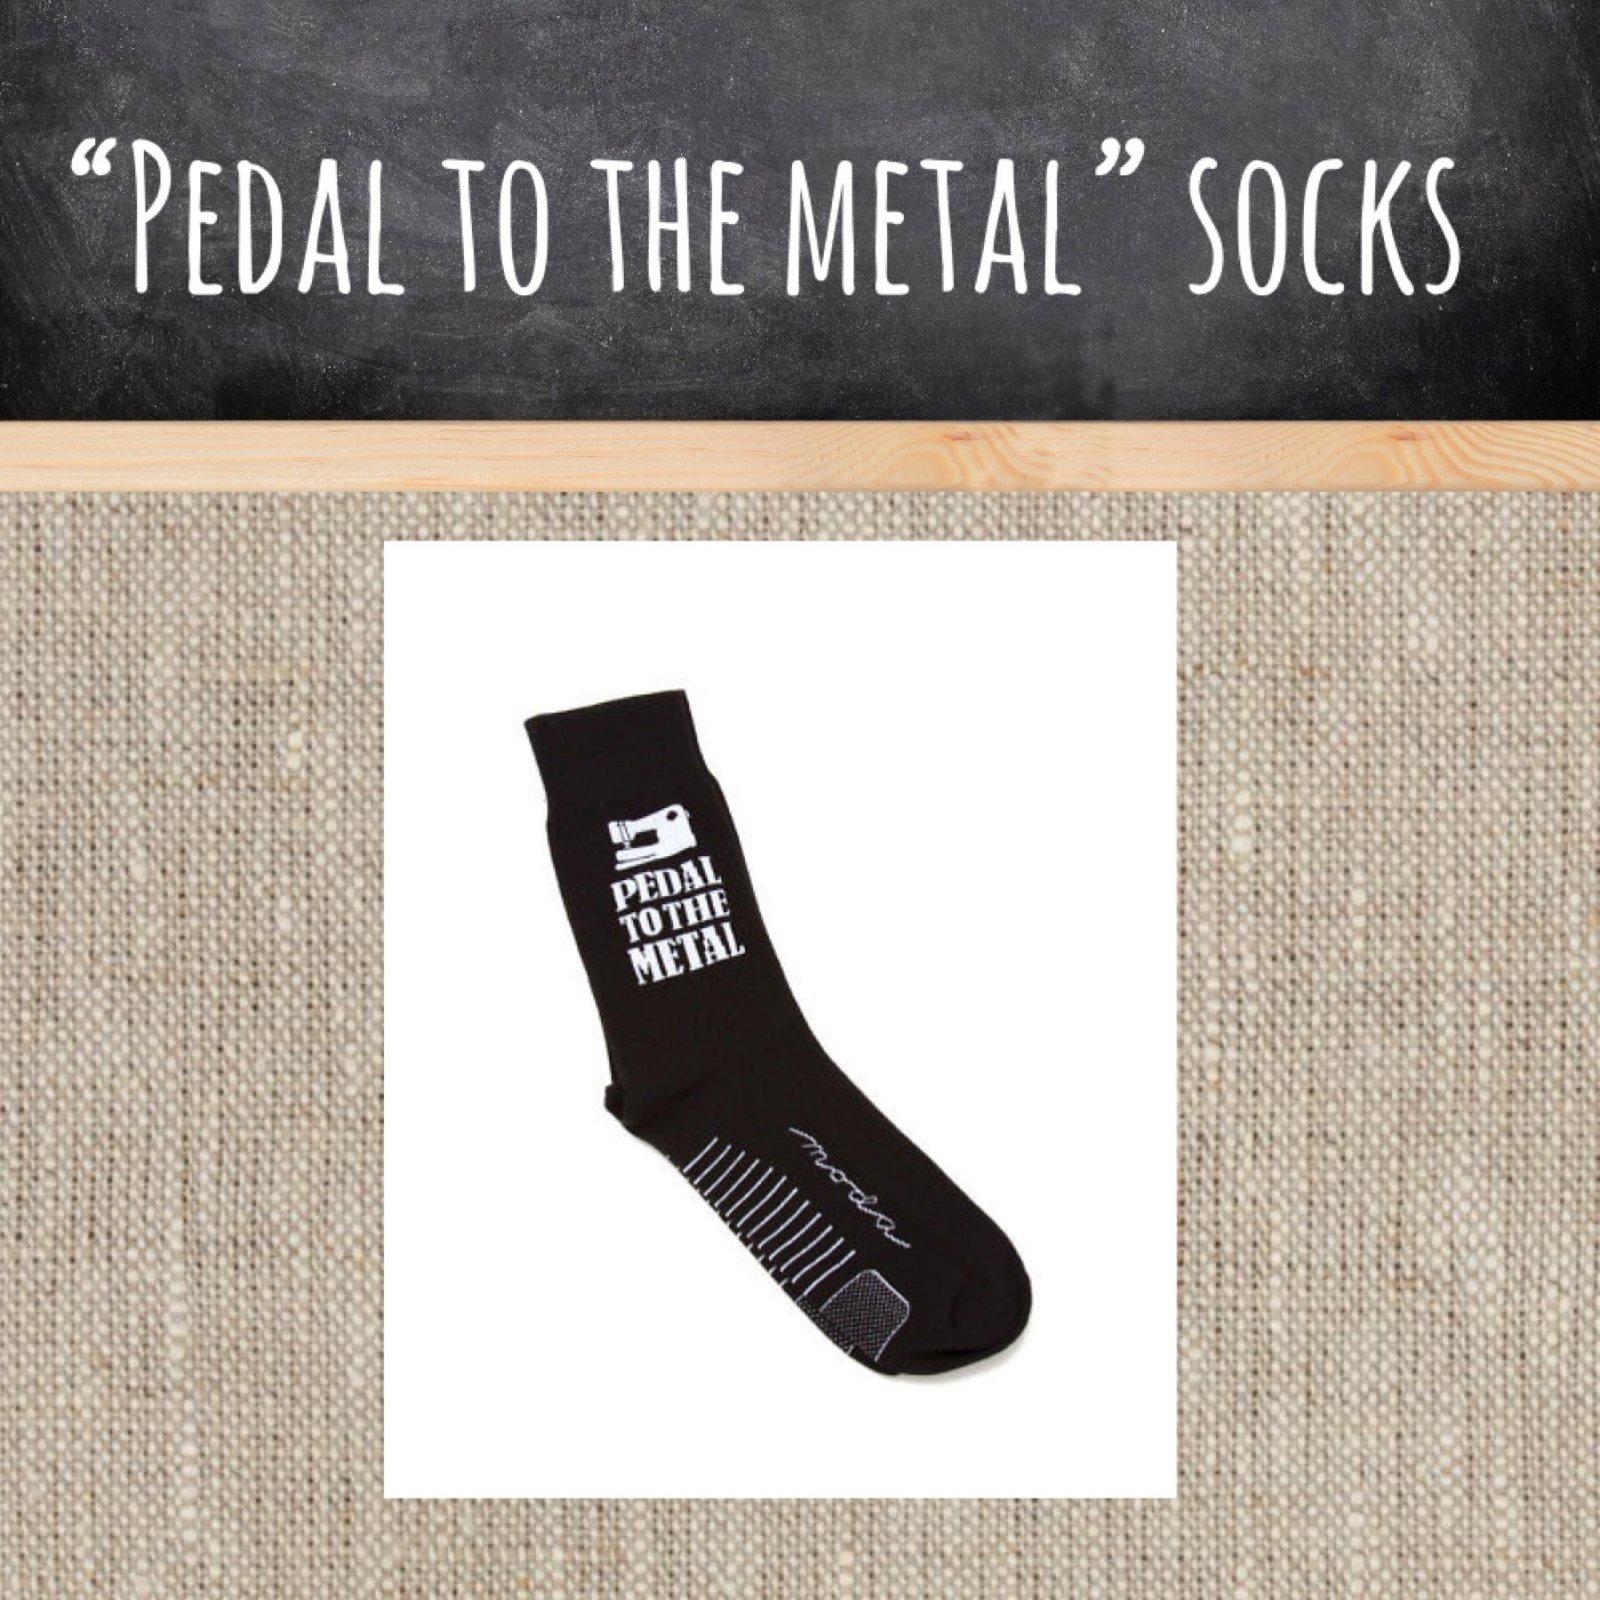 Pedal to the Metal Socks